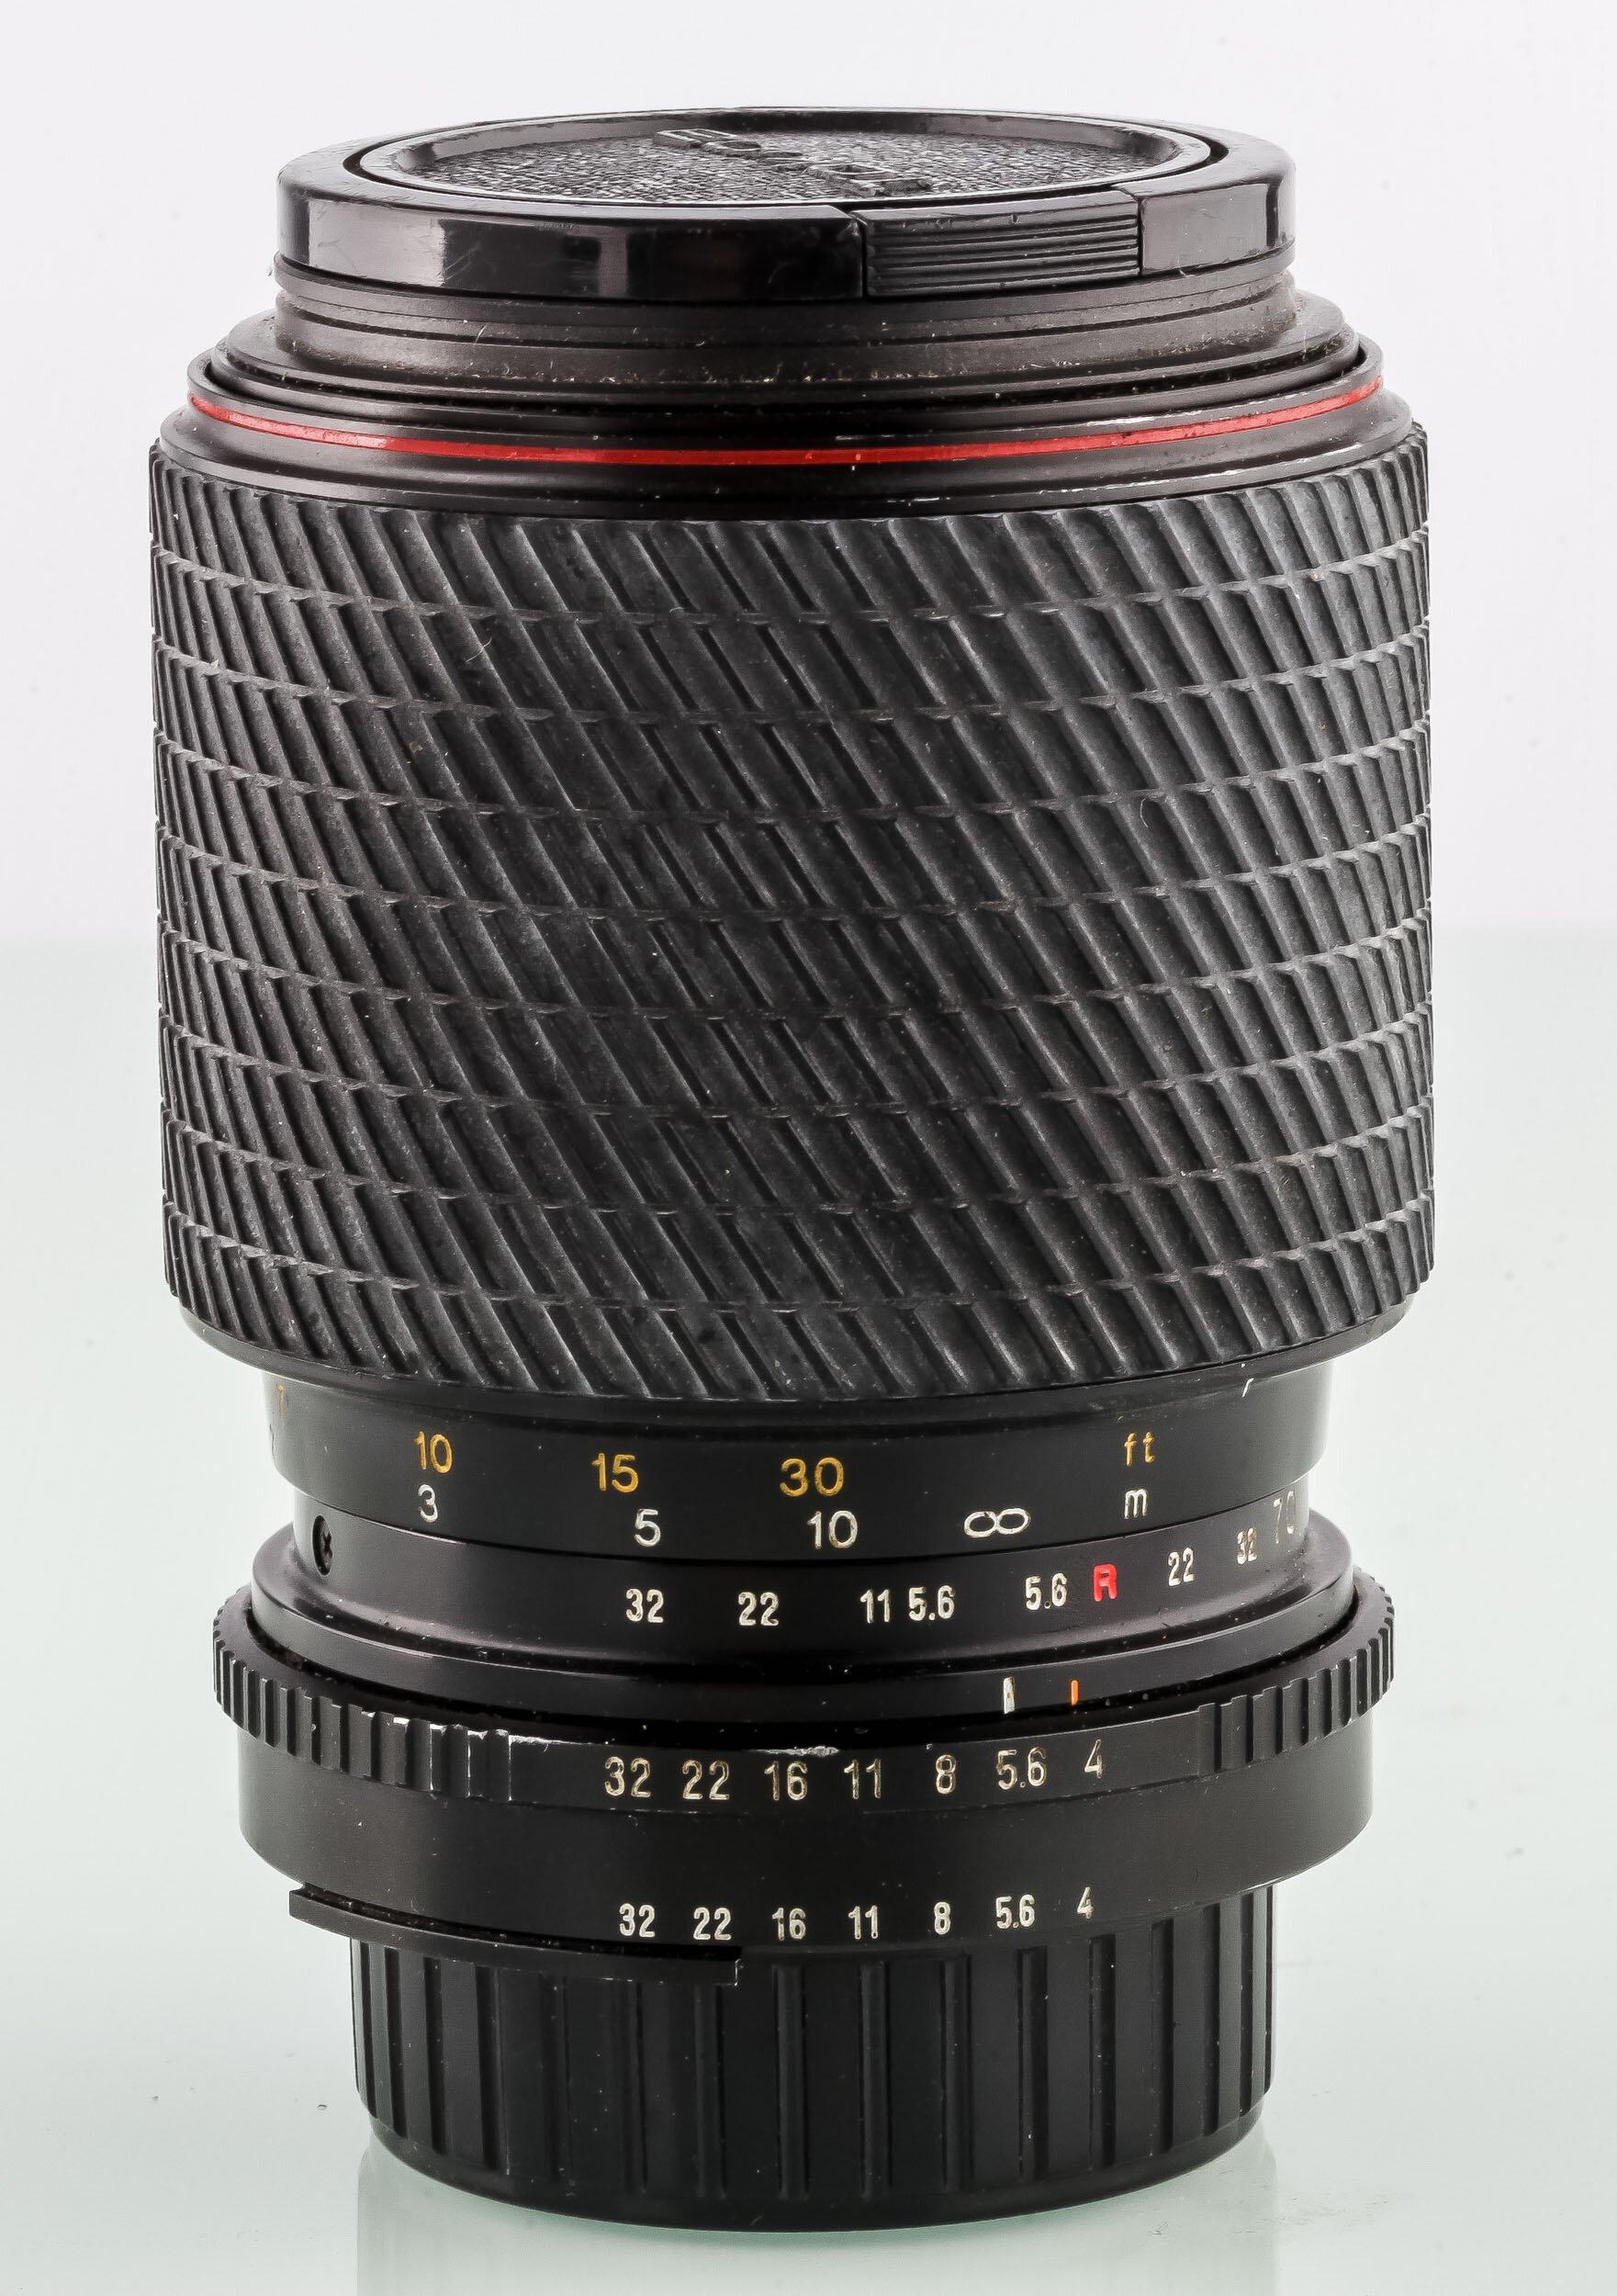 Tokina f.Nikon 70-210mm 4,5-5,6 SD manuelles Objektiv